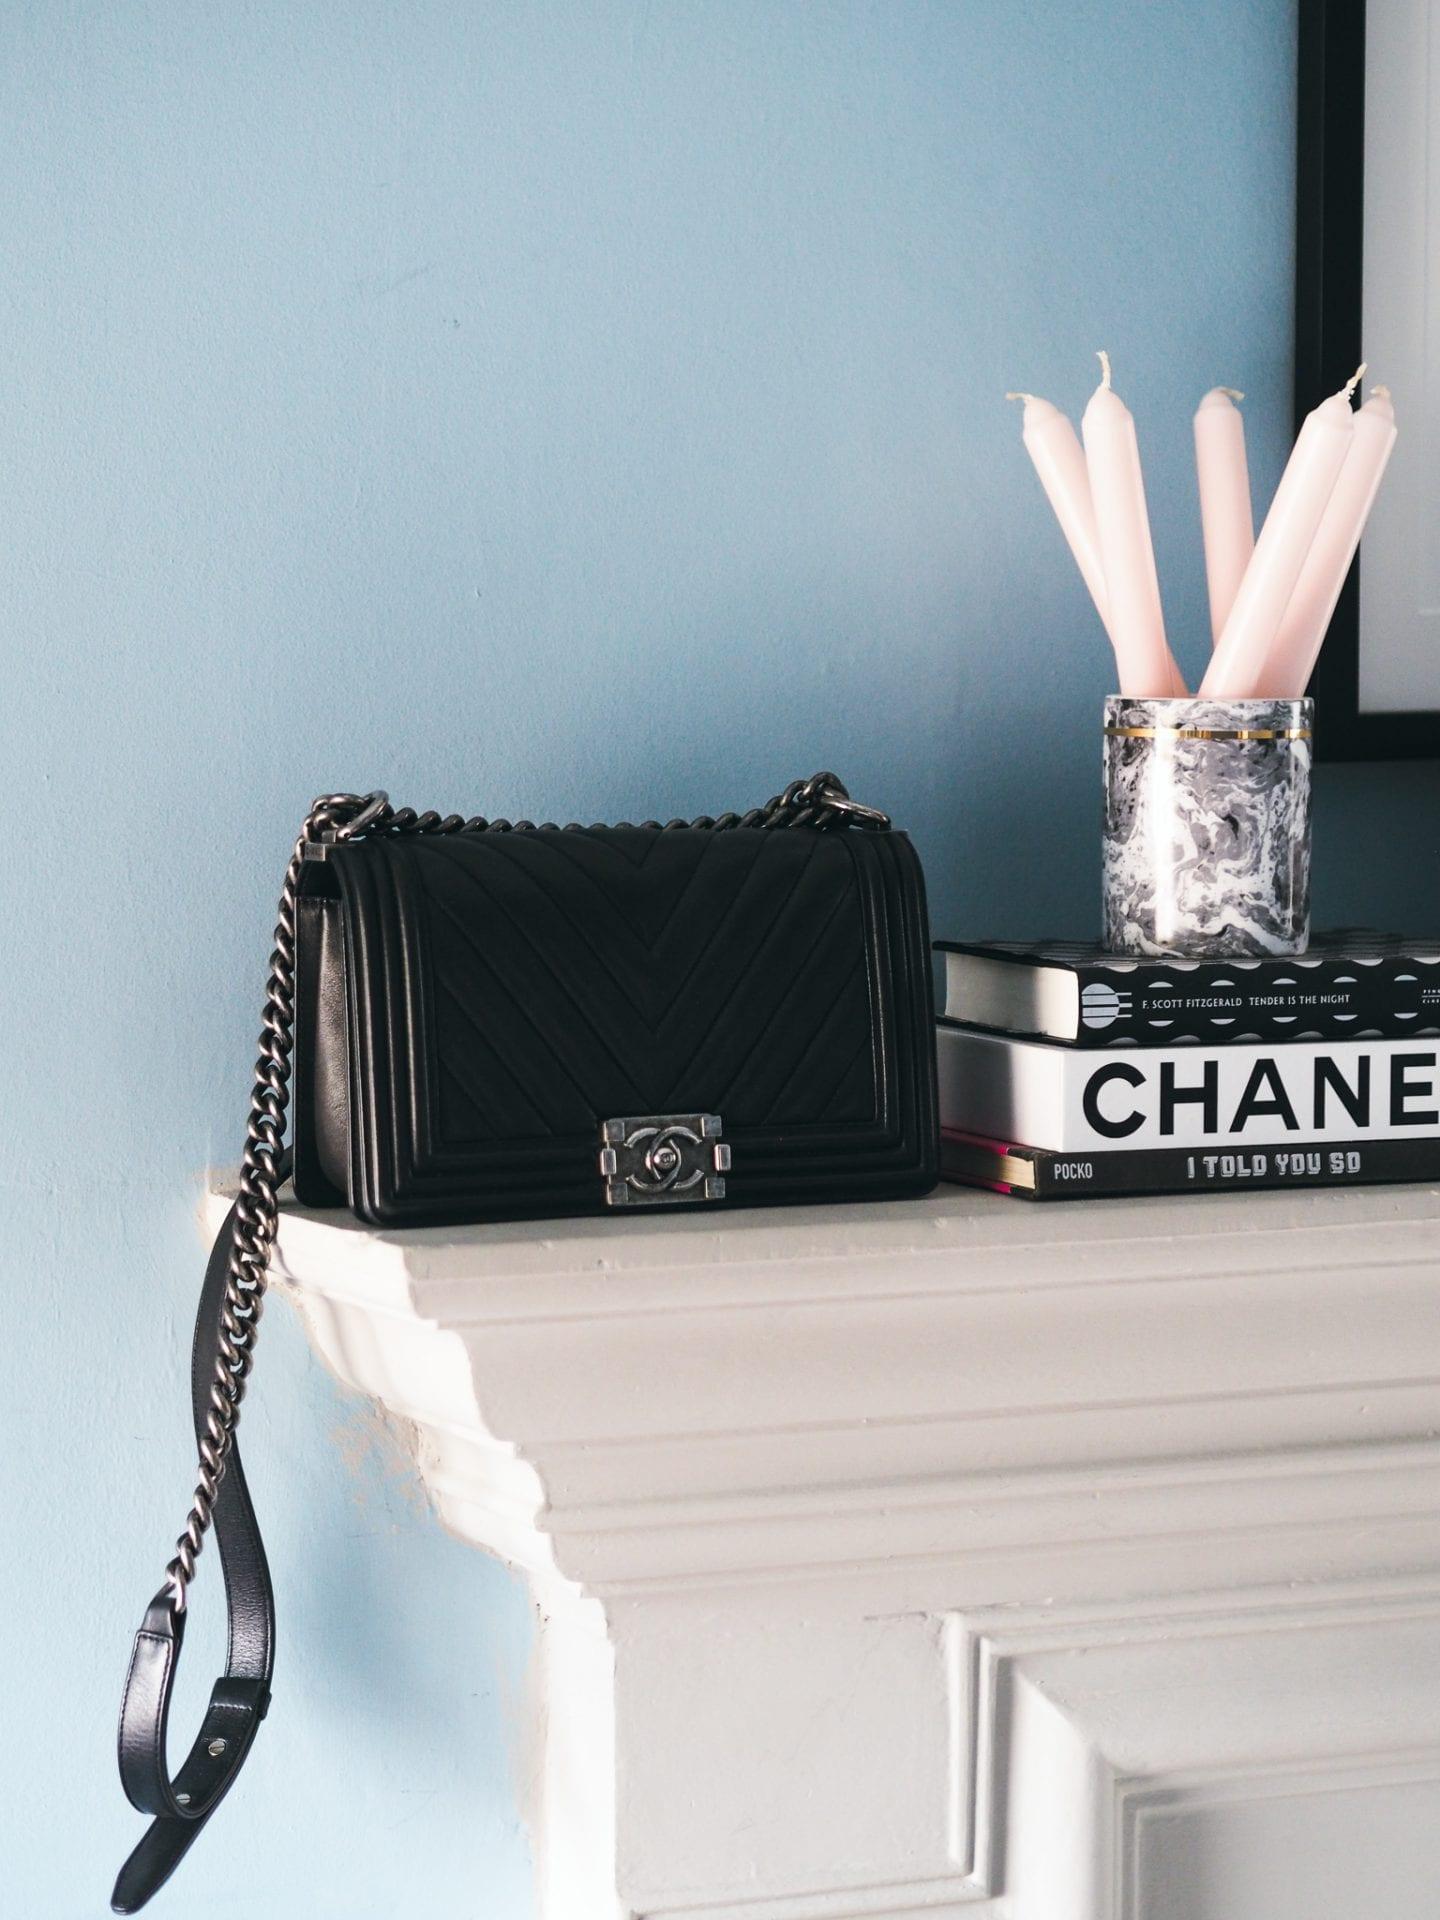 chanel-boy-bag-strap-review-chain-handle-strap